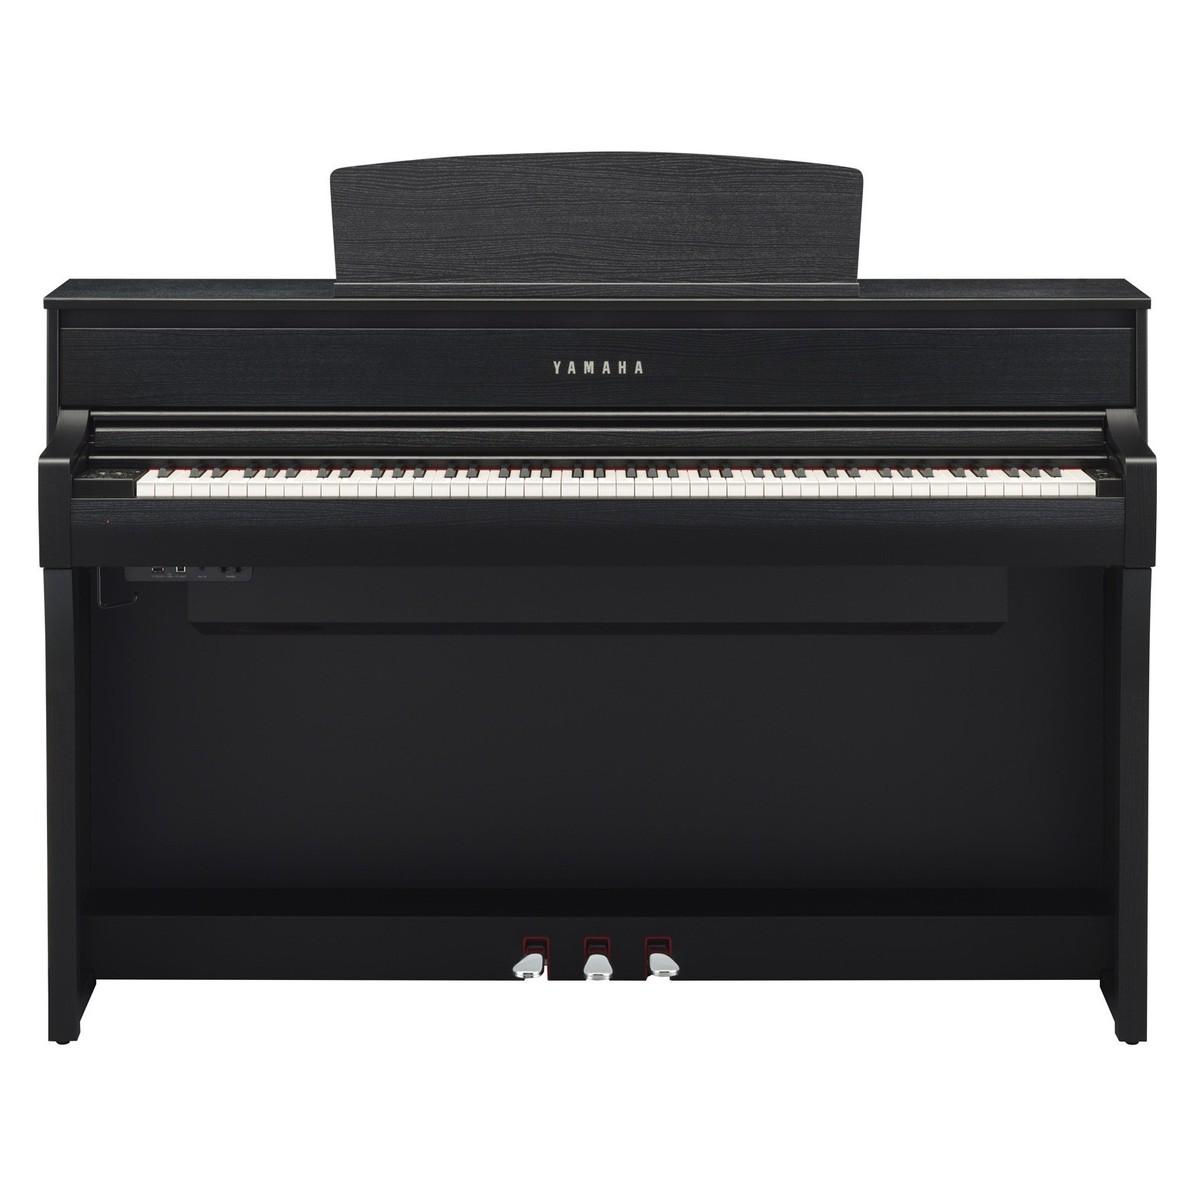 Yamaha clp 675 digital piano satin black at for Yamaha clp 675